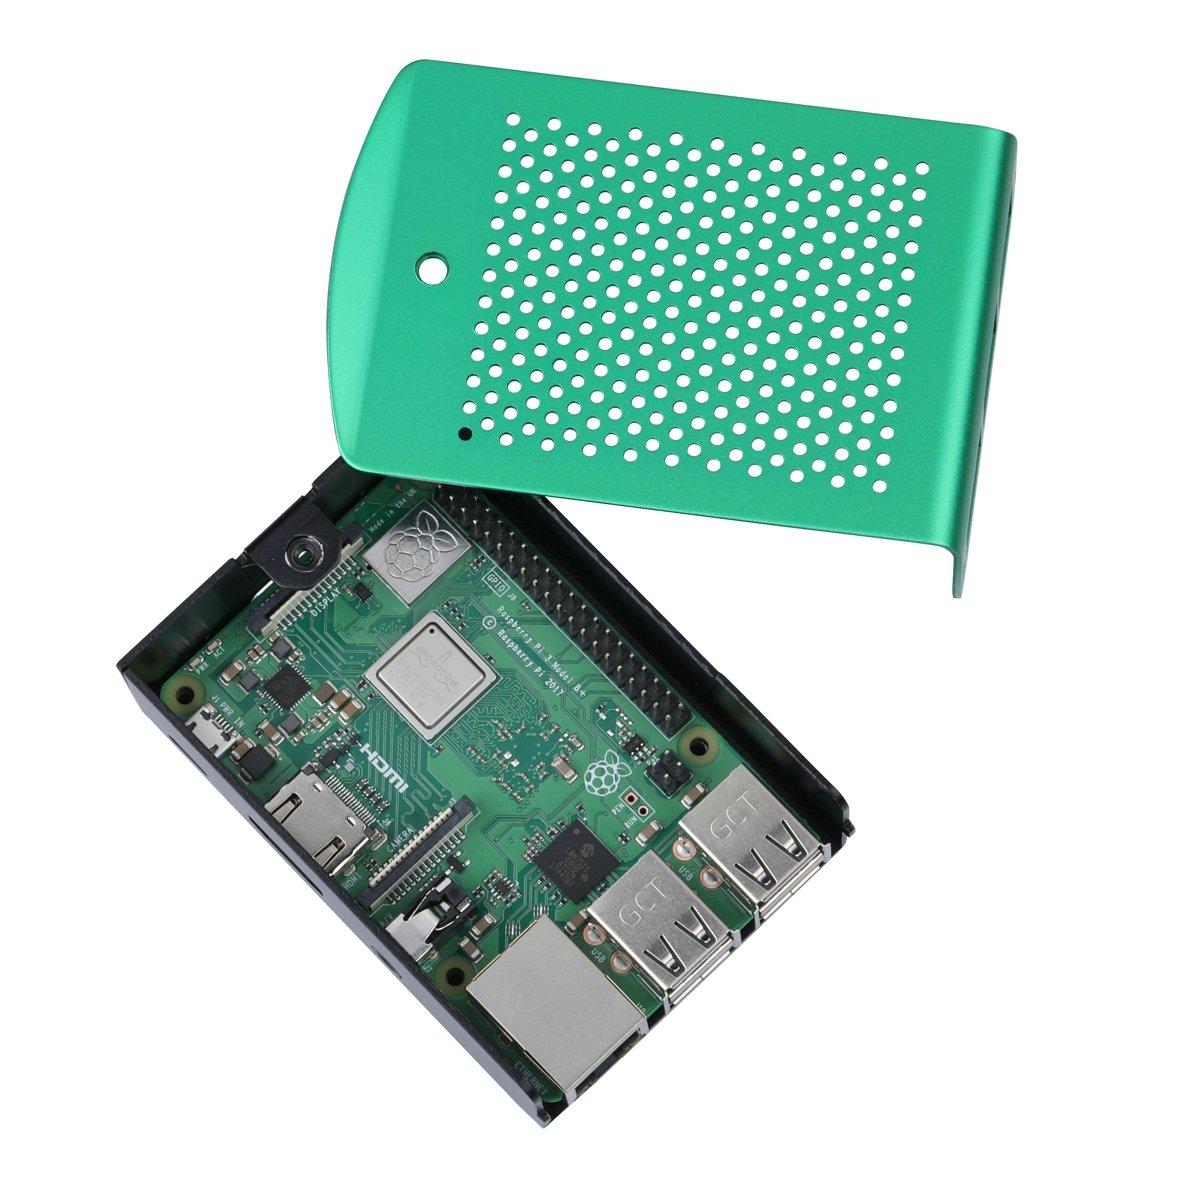 Amazon.com: Raspberry Pi 3 Modelo B + Aluminio Carcasa Metal ...